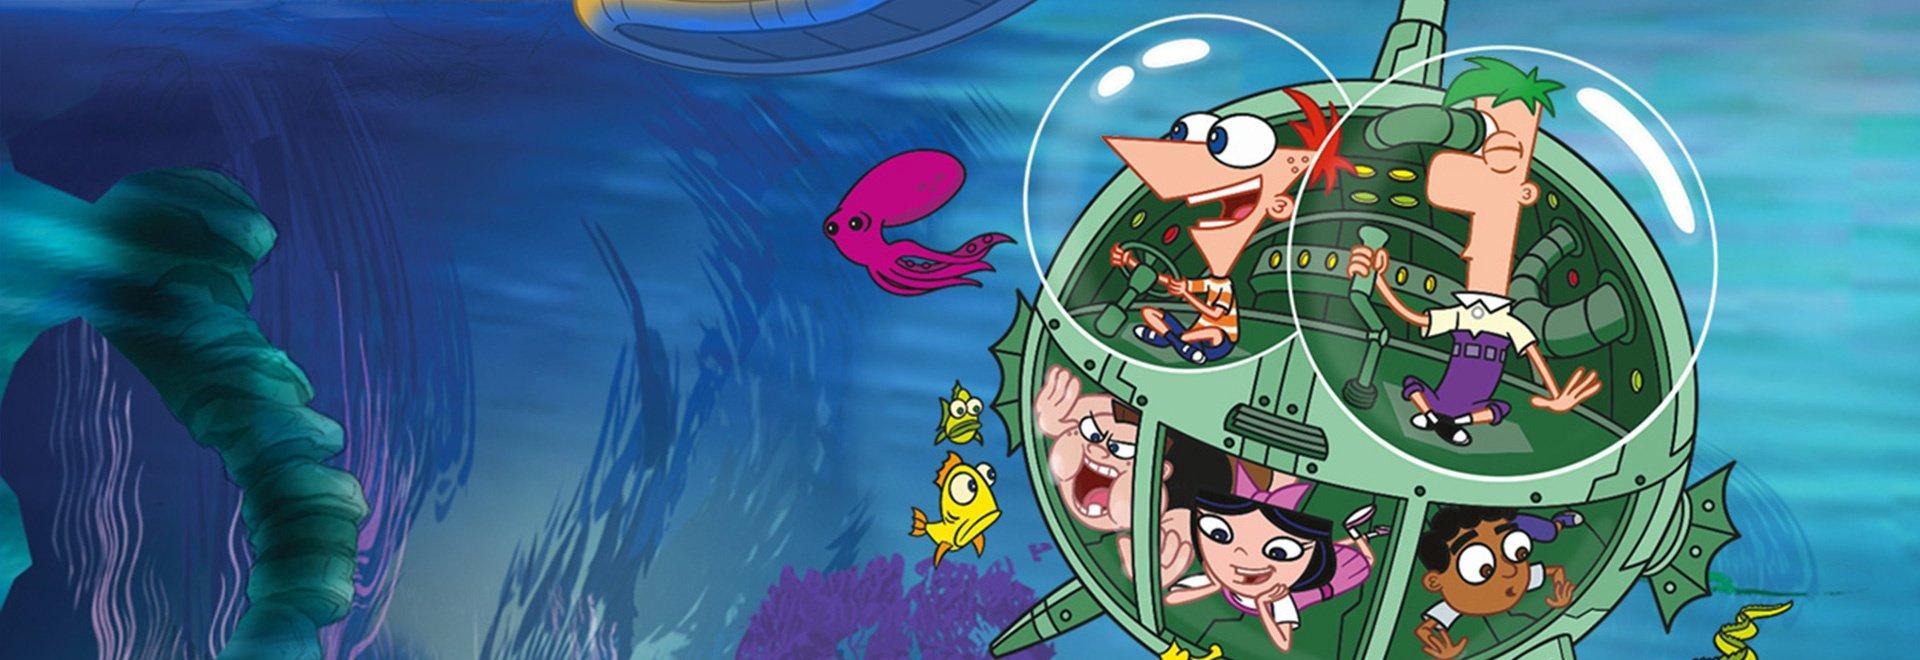 Dov'e' Pinky?